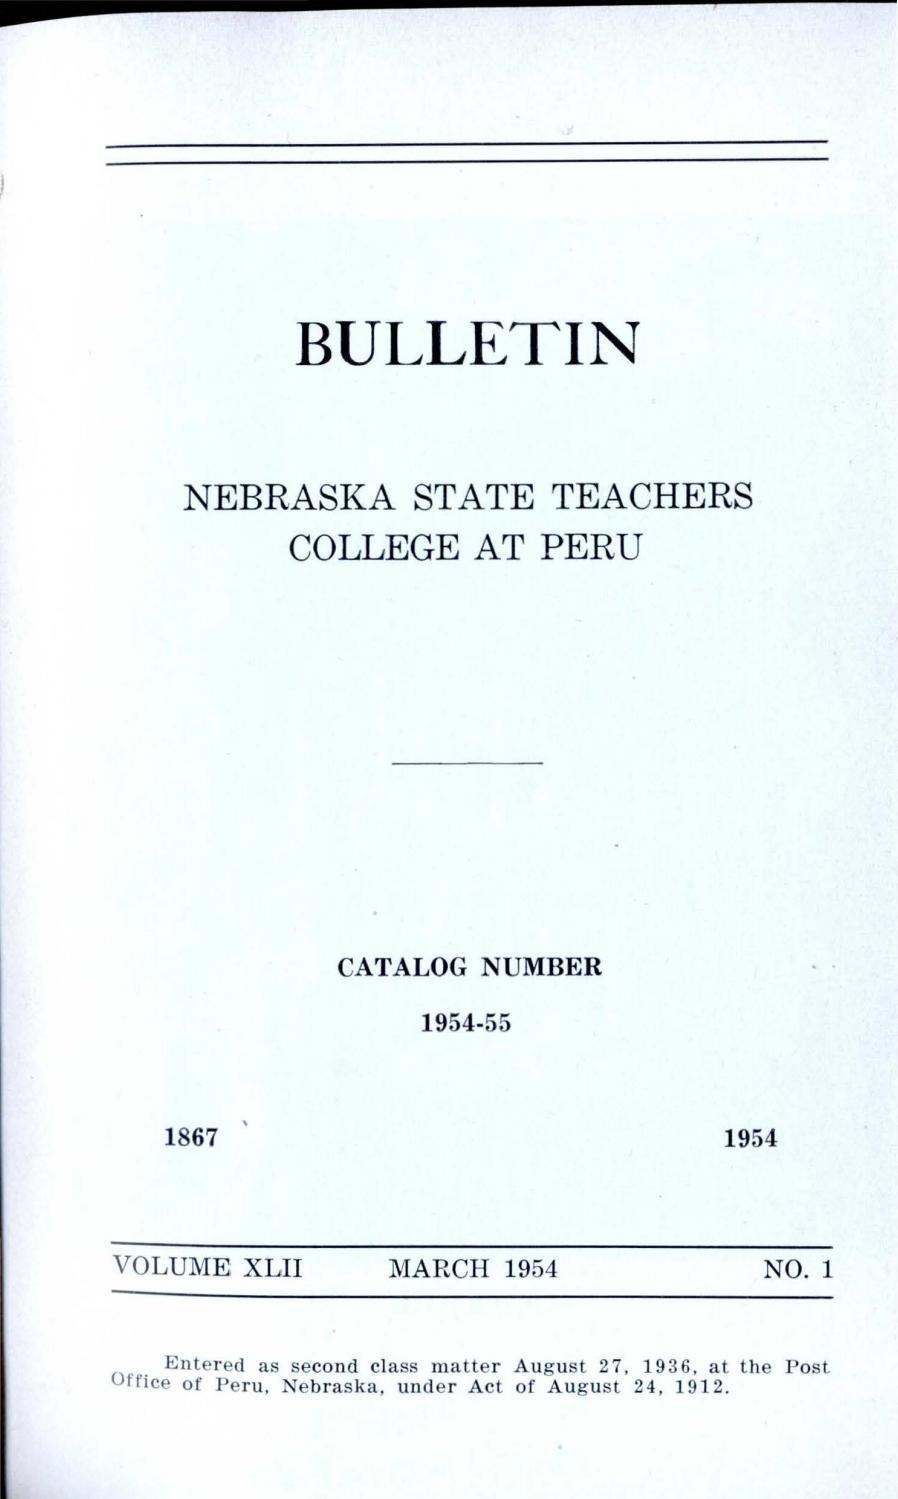 1954-1955 Catalog of Peru State Teachers College (Nebraska